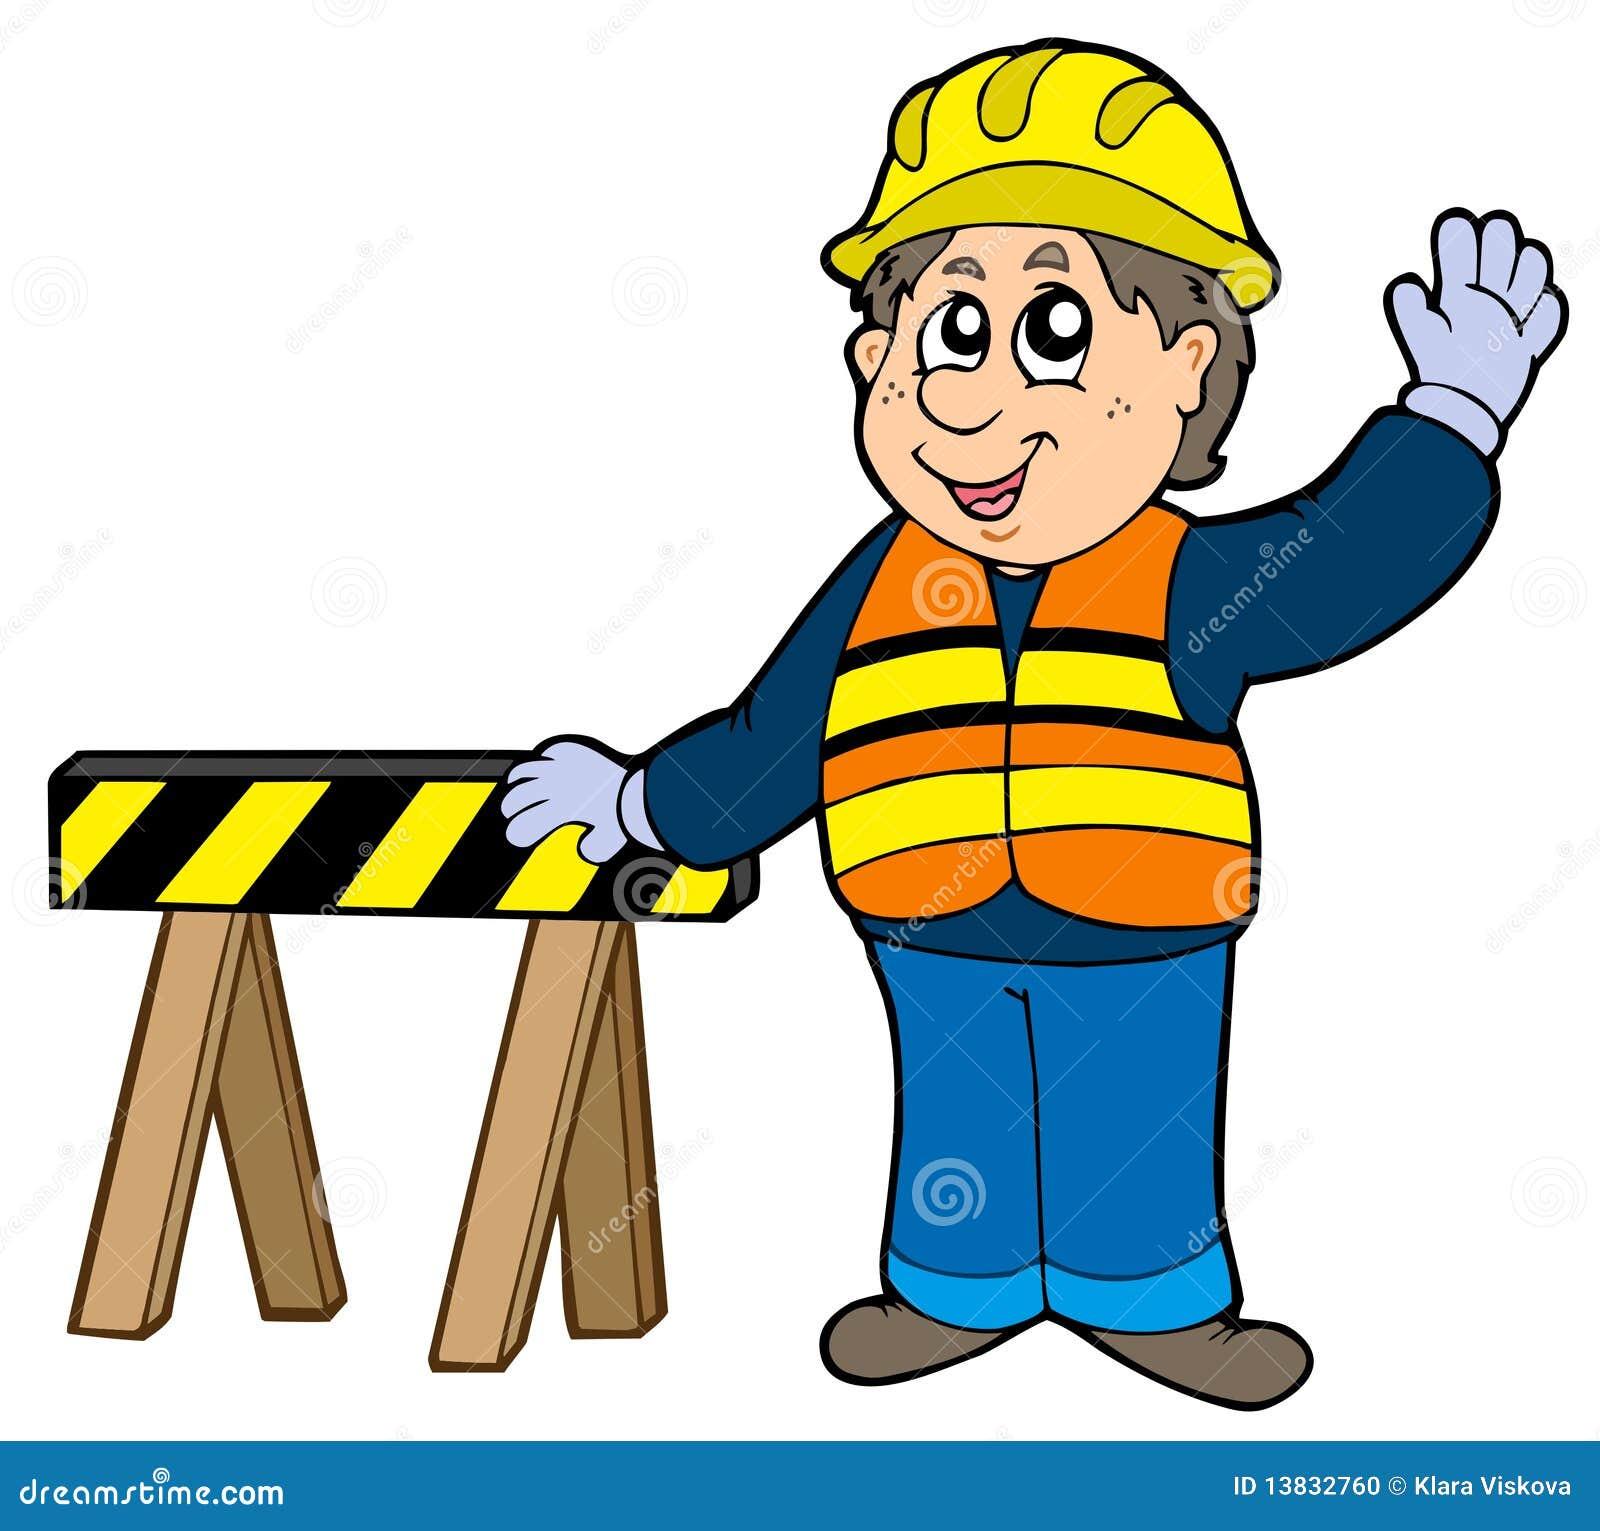 Bauarbeiter clipart schwarz weiß  Bauarbeiter Karikatur Stock Illustrationen, Vektors, & Klipart ...